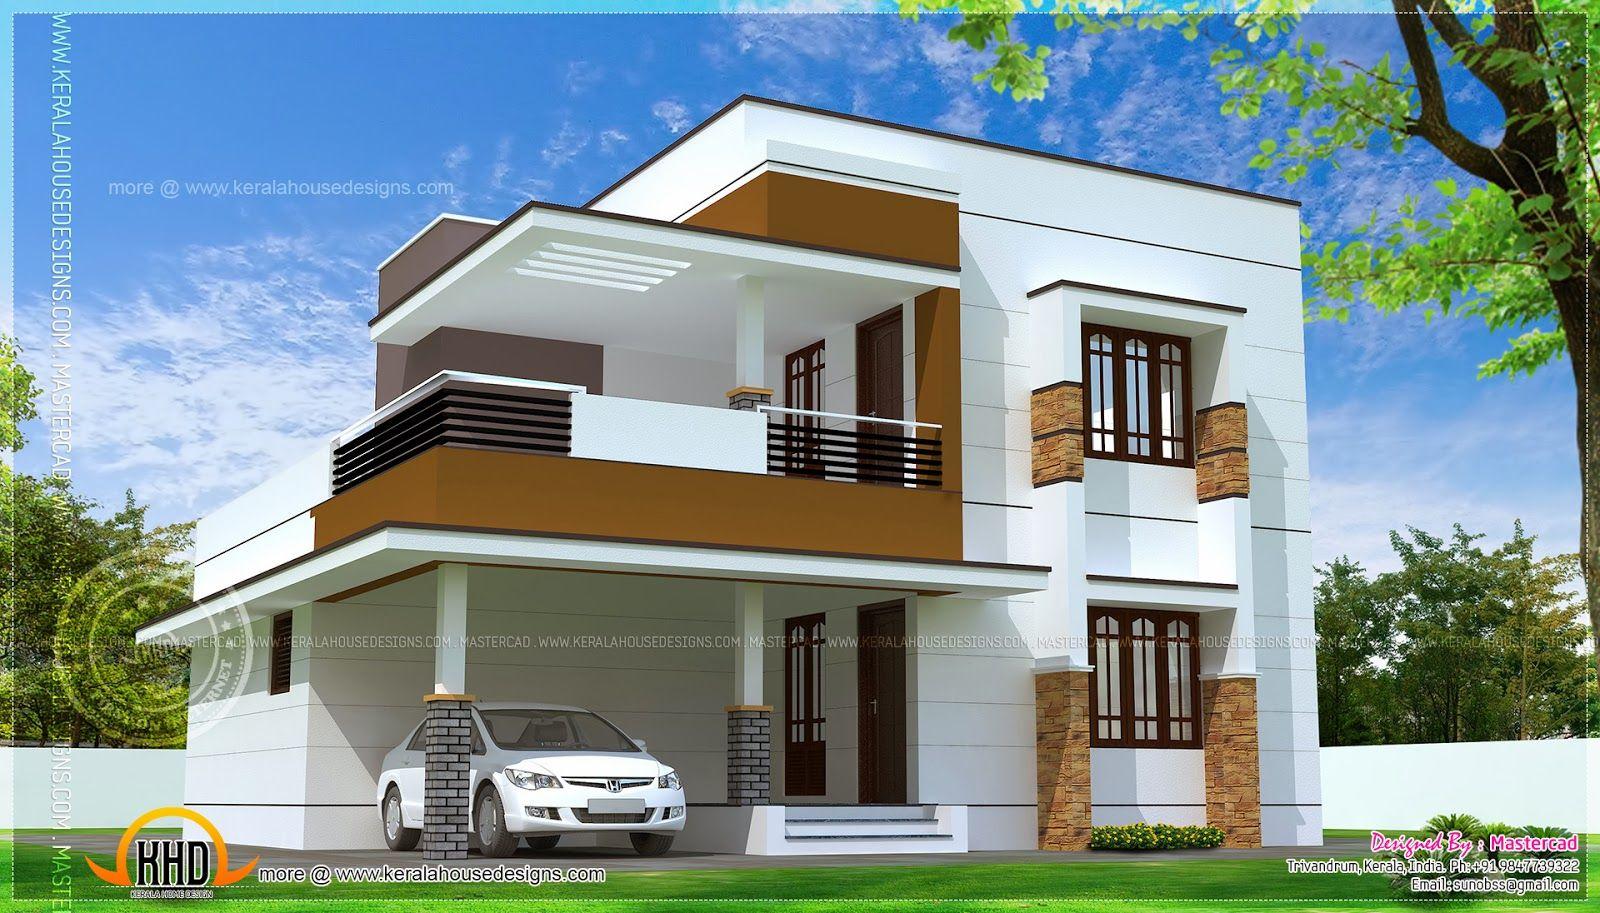 Simple Home Design Jpg 1600 913 Kerala House Design Simple